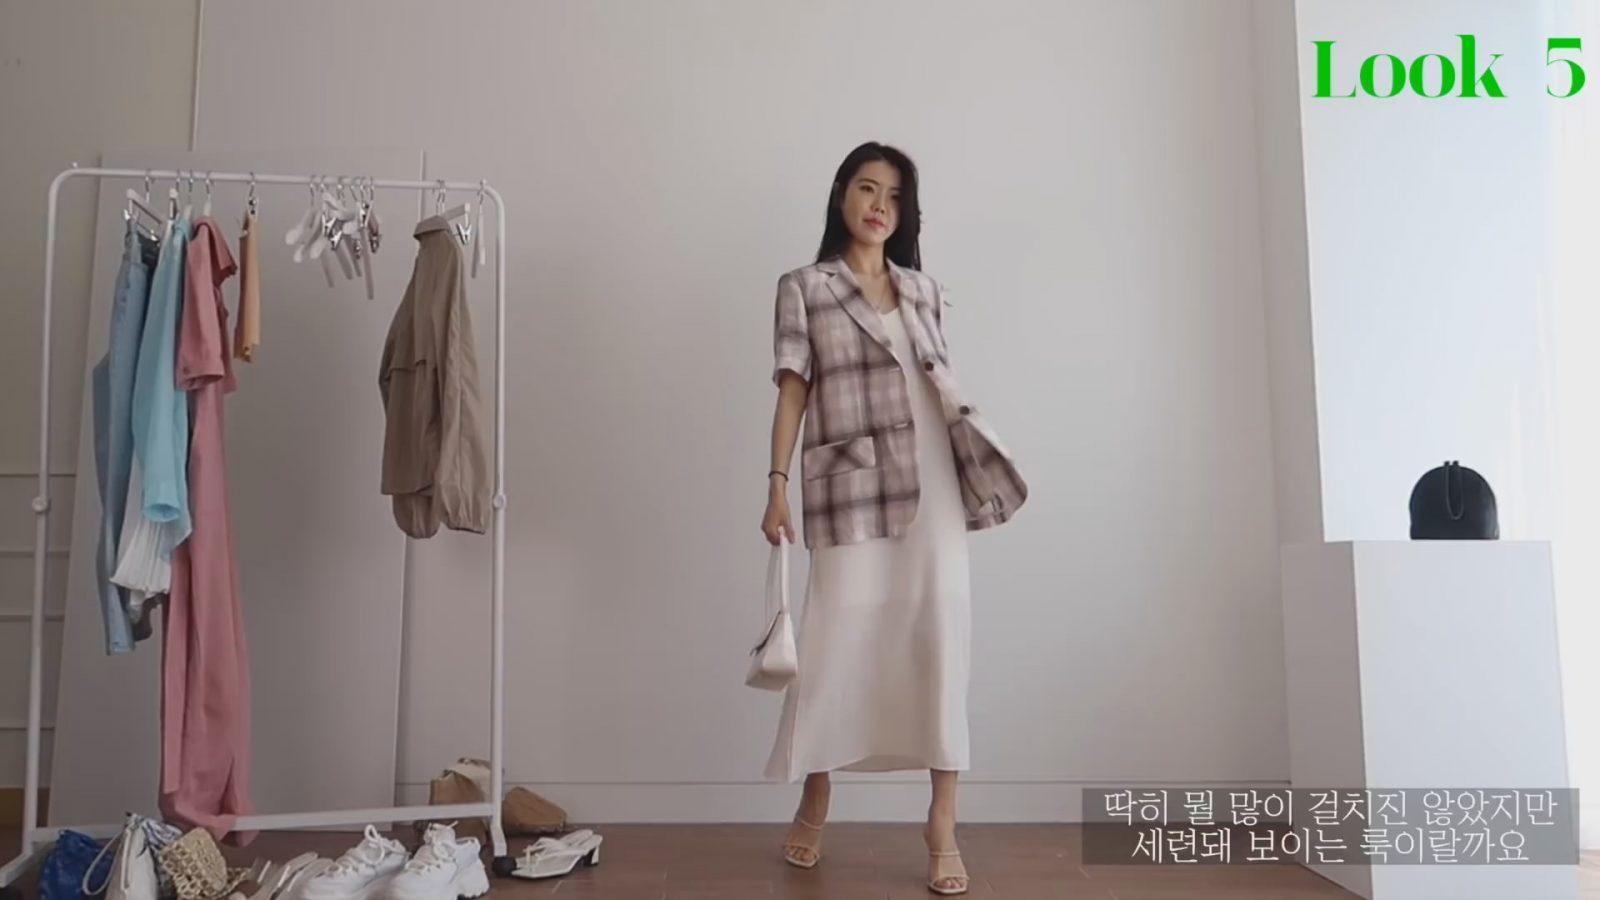 Корейский лук для лета 2020 от 황꿀 gguul's boundary